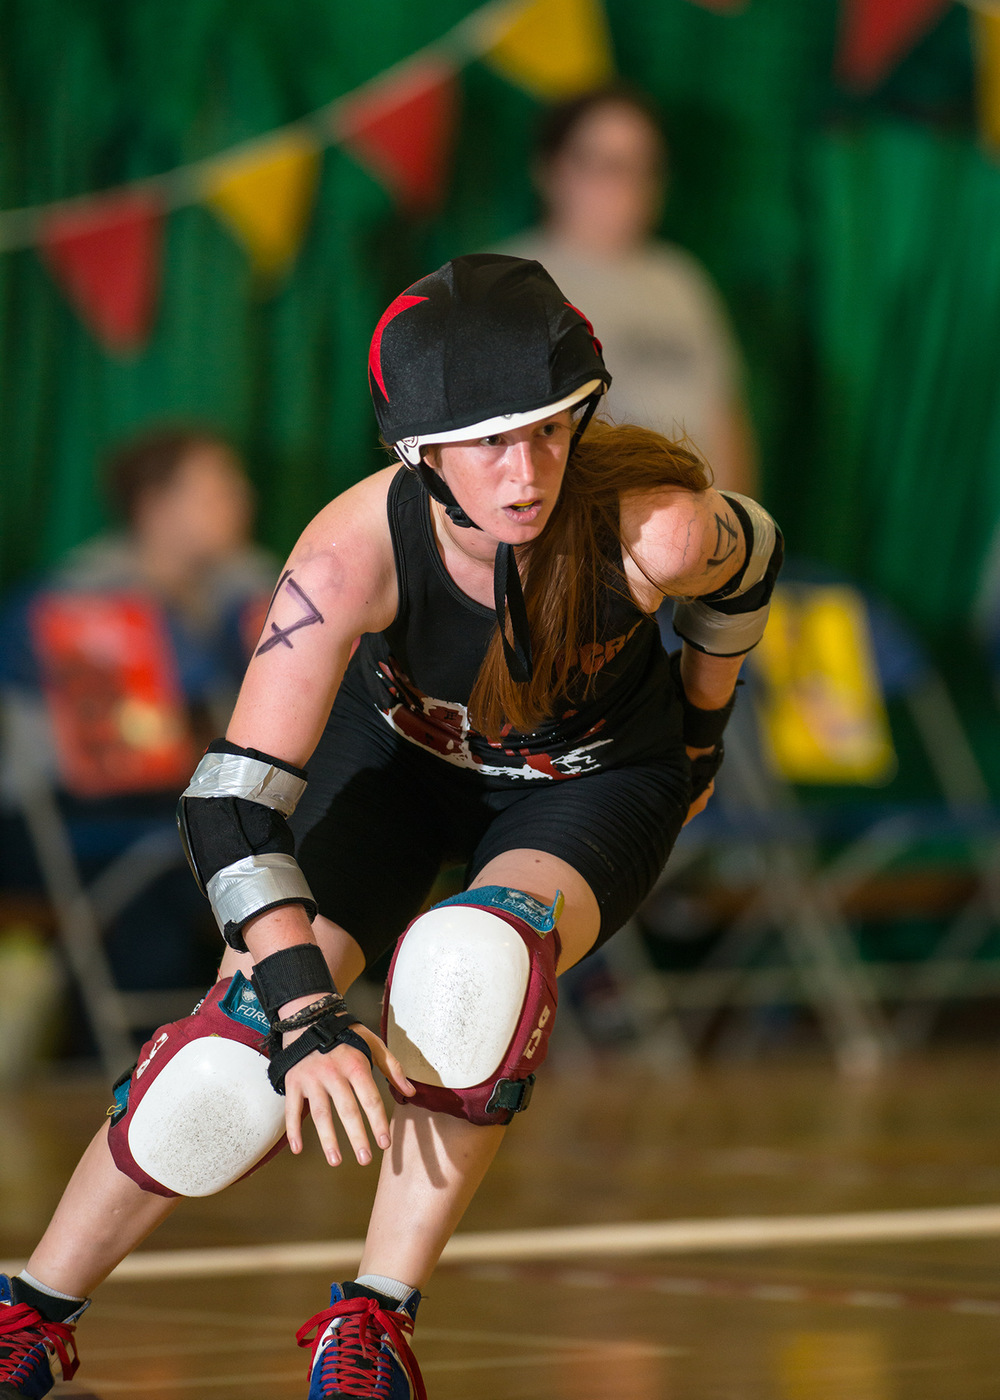 Roller Derby Photography - Jur-ass-kick Park PCRG vs Dorset